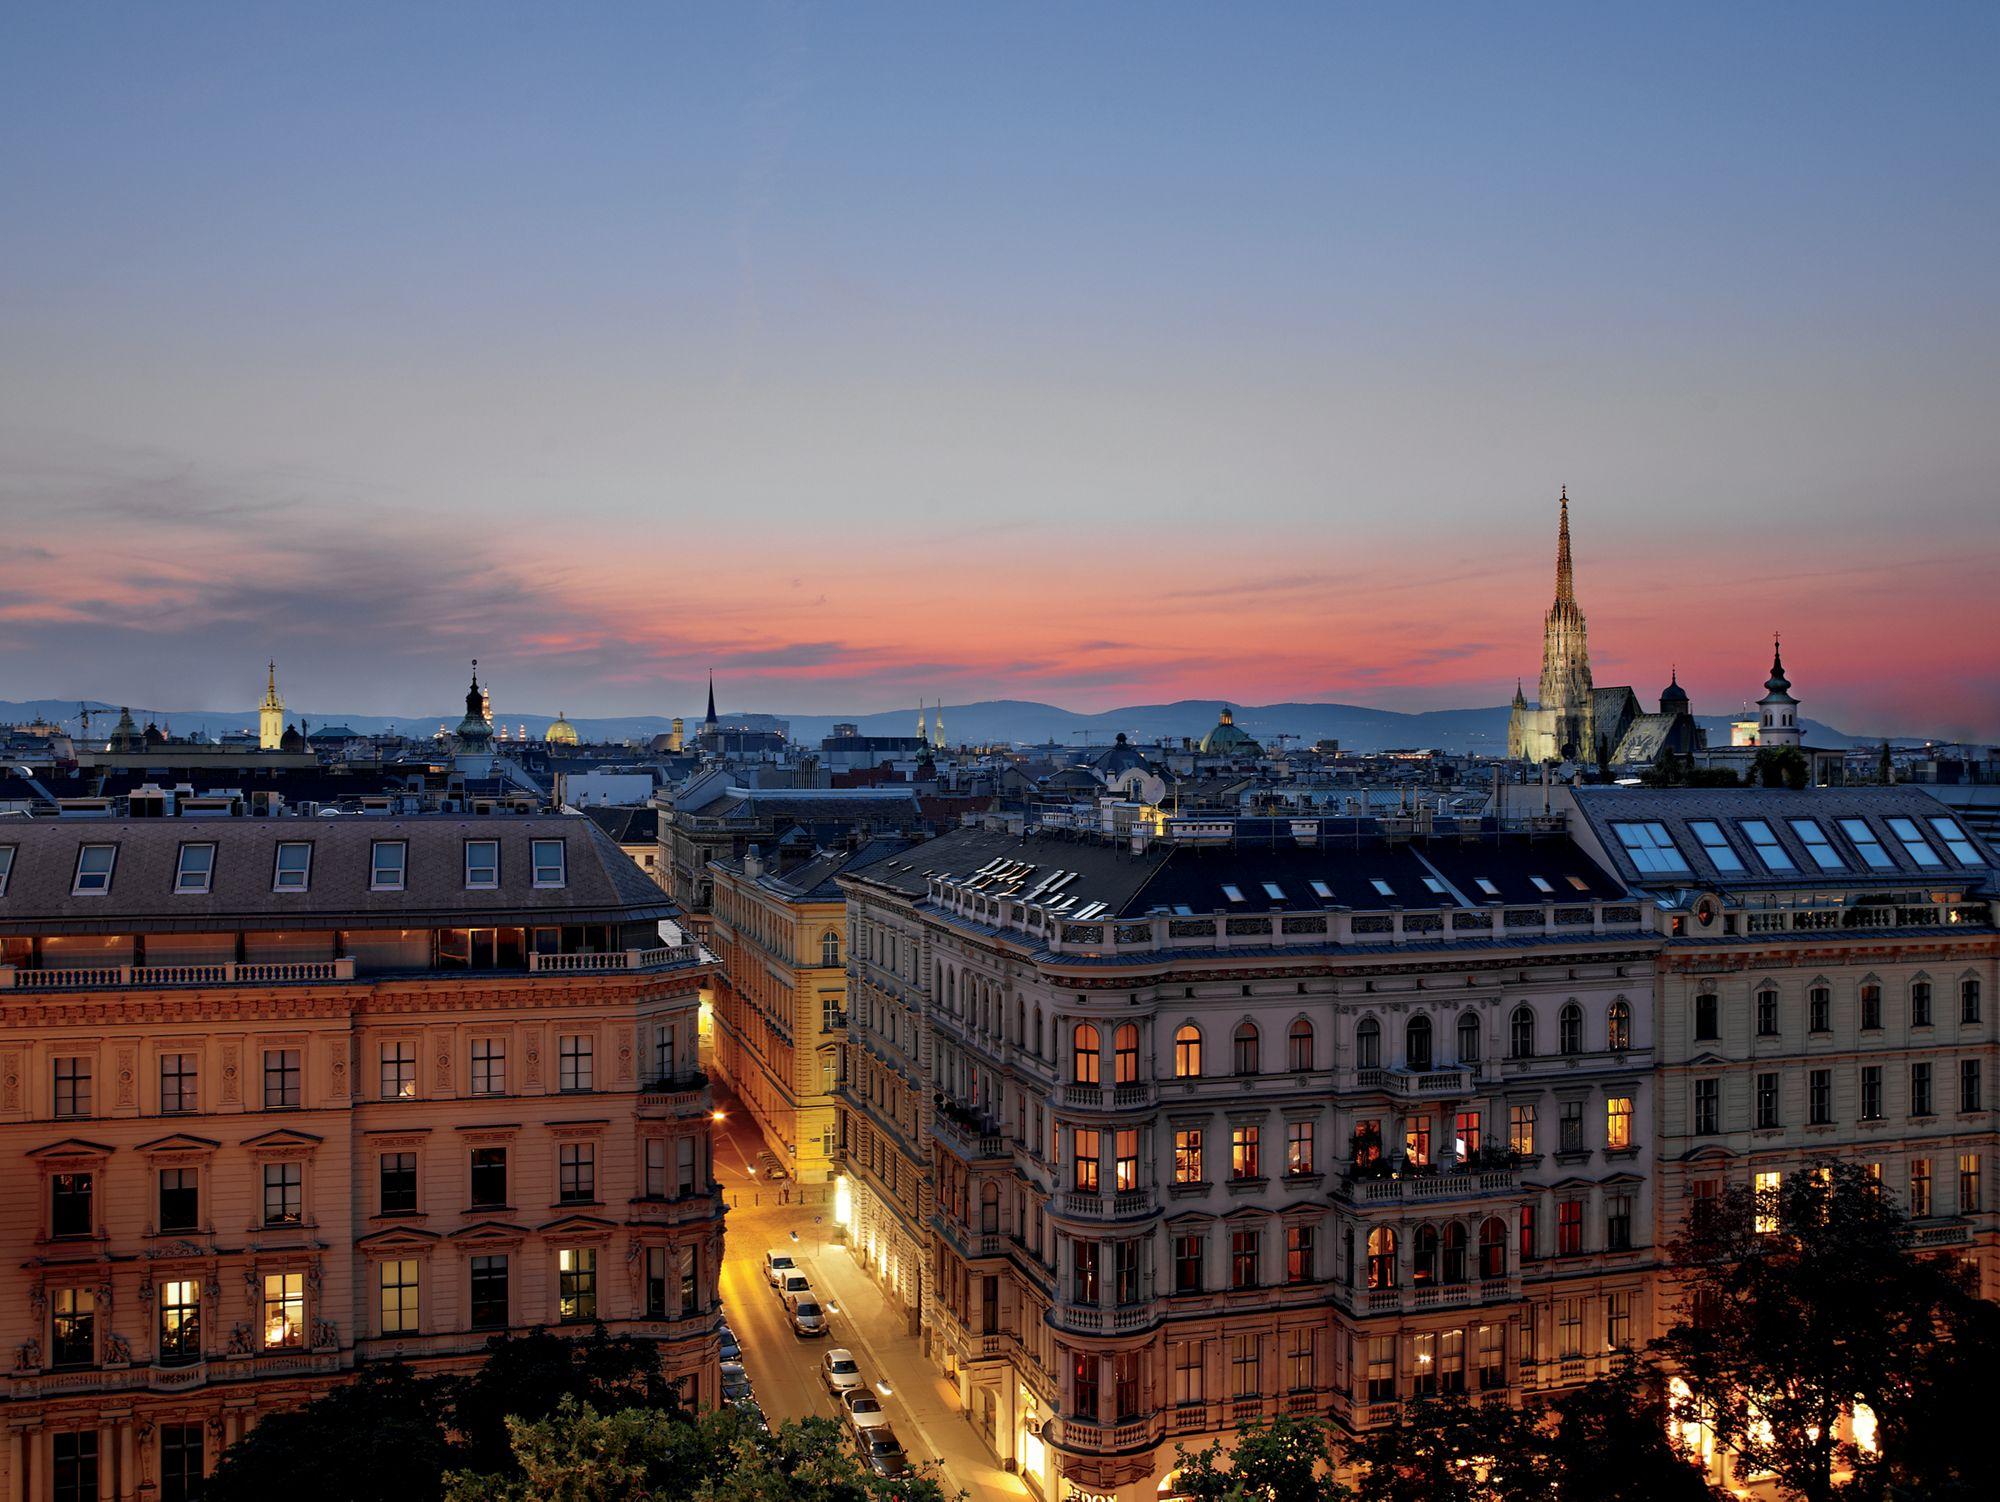 Luxury Hotels Resorts In Europe The Ritz Carlton